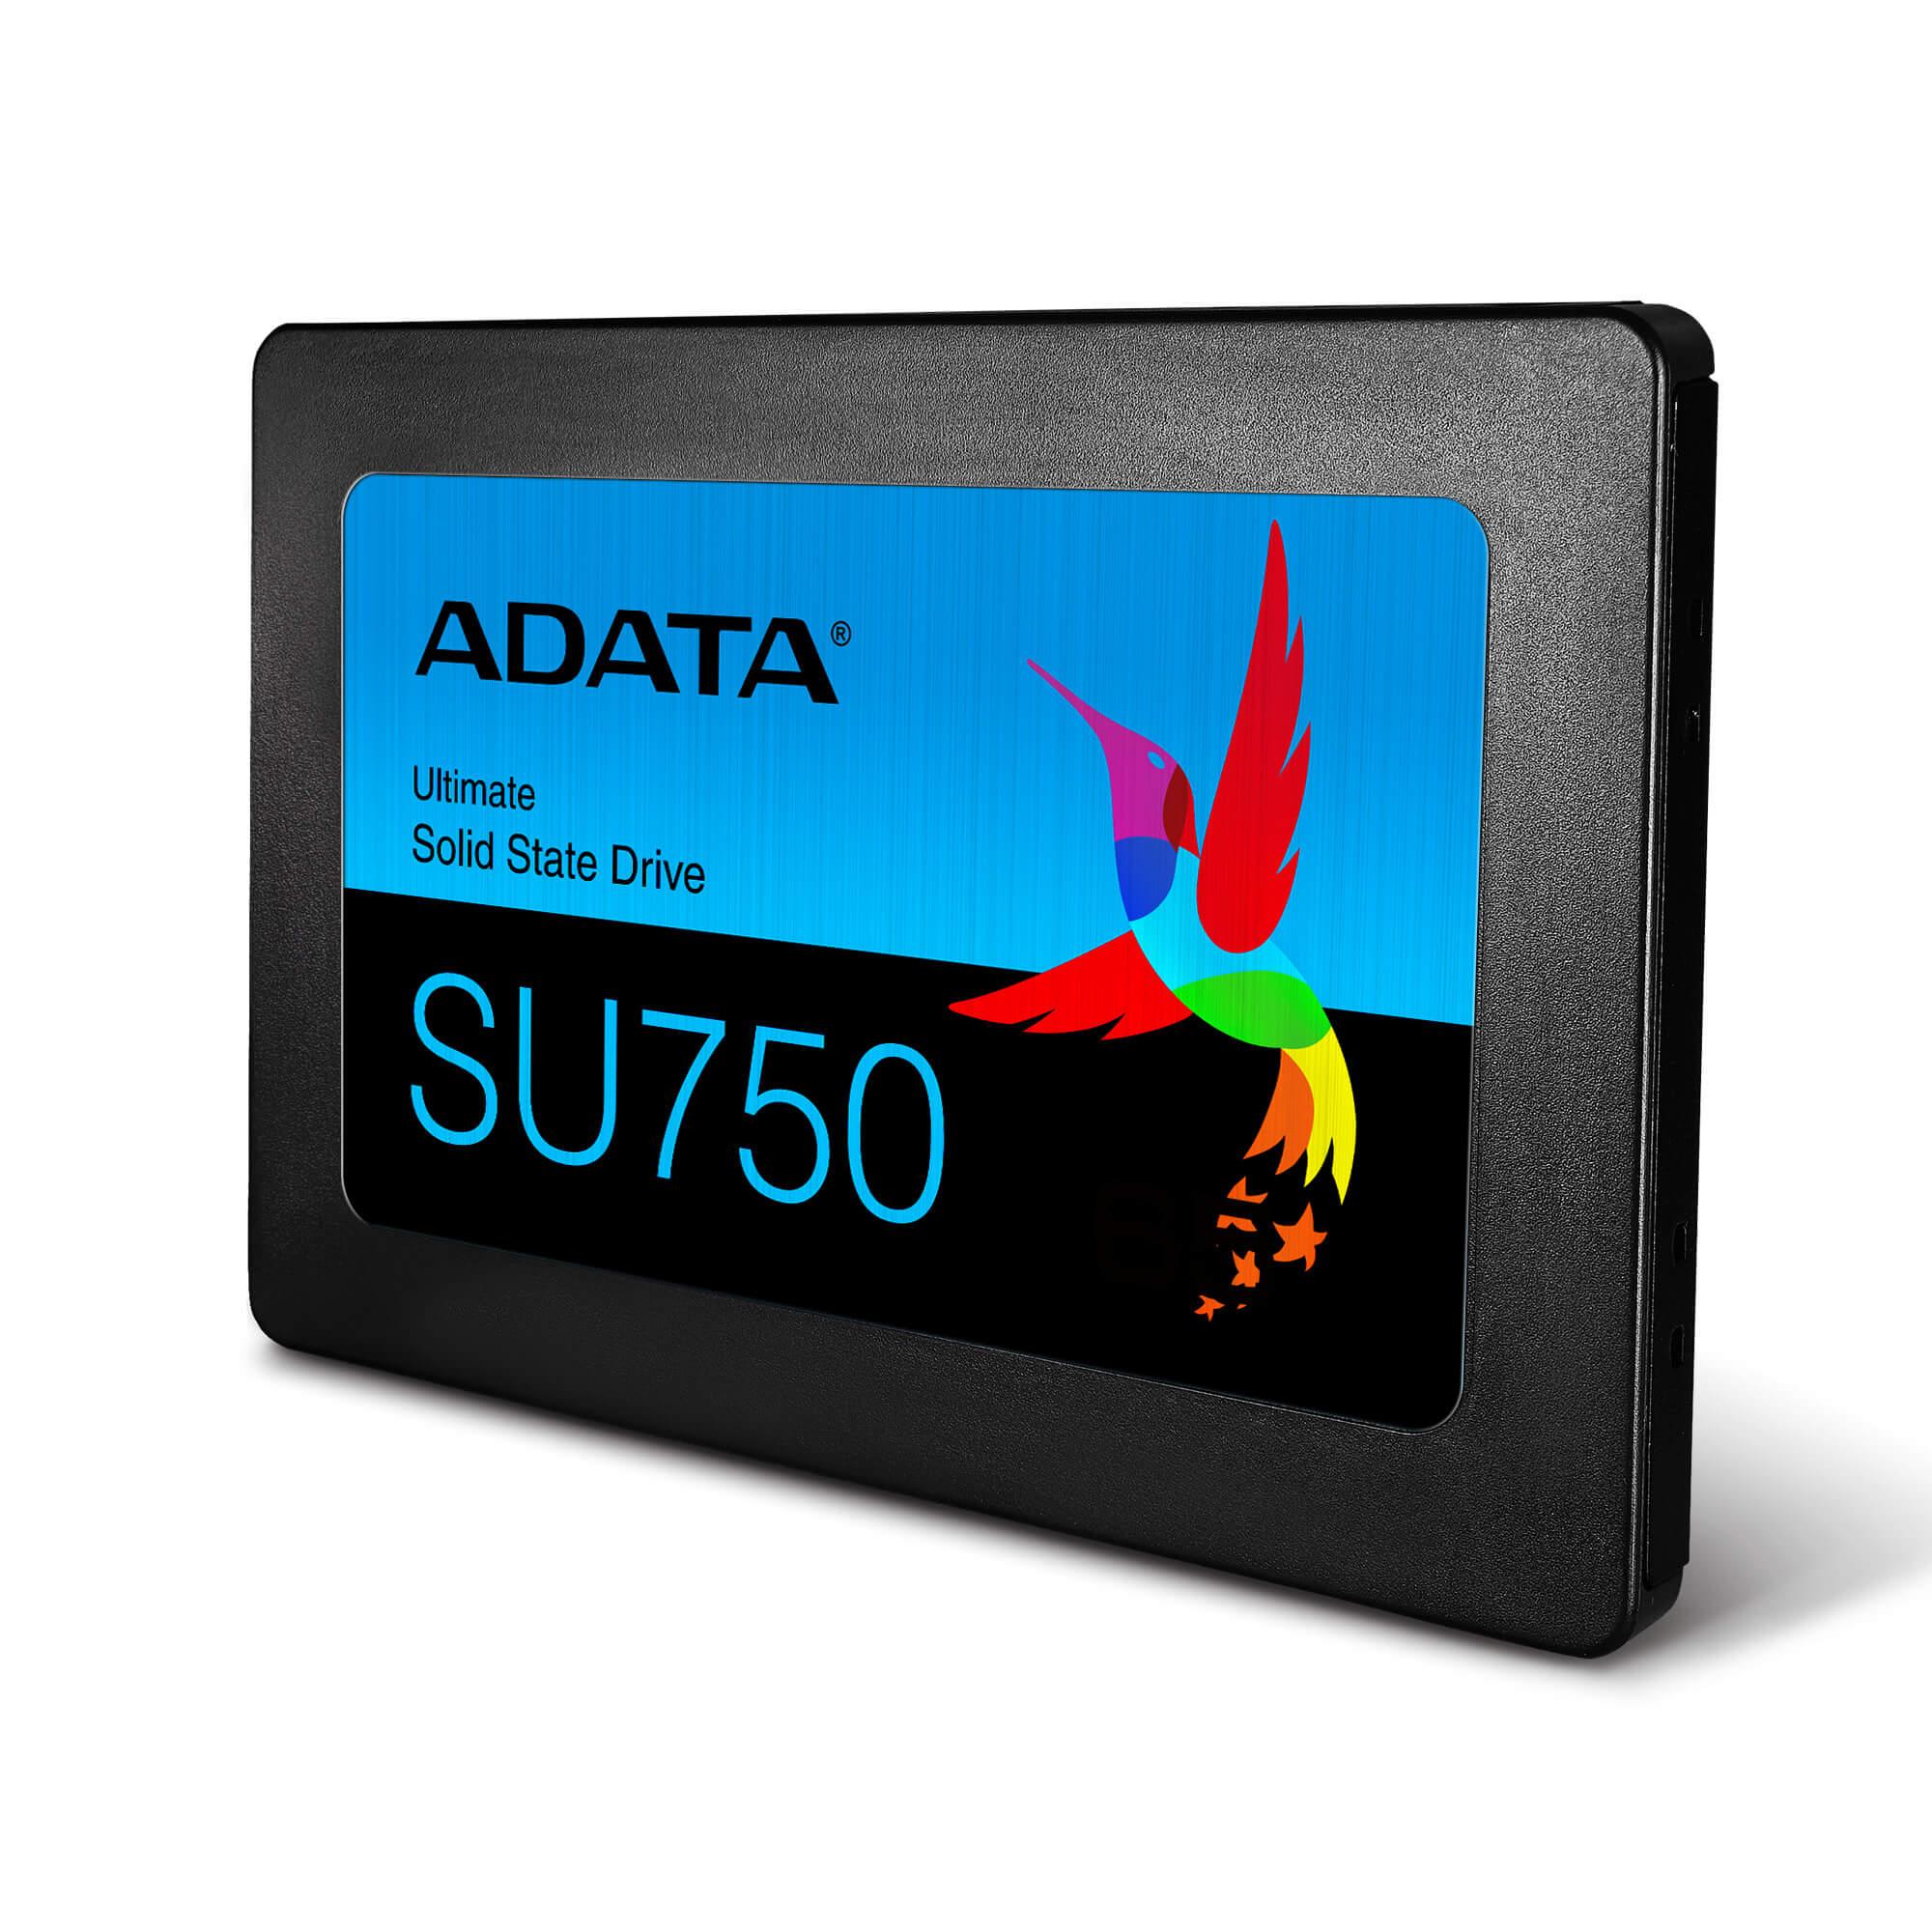 ADATA Ultimate SU750 - ADATA Day Lucky Draw